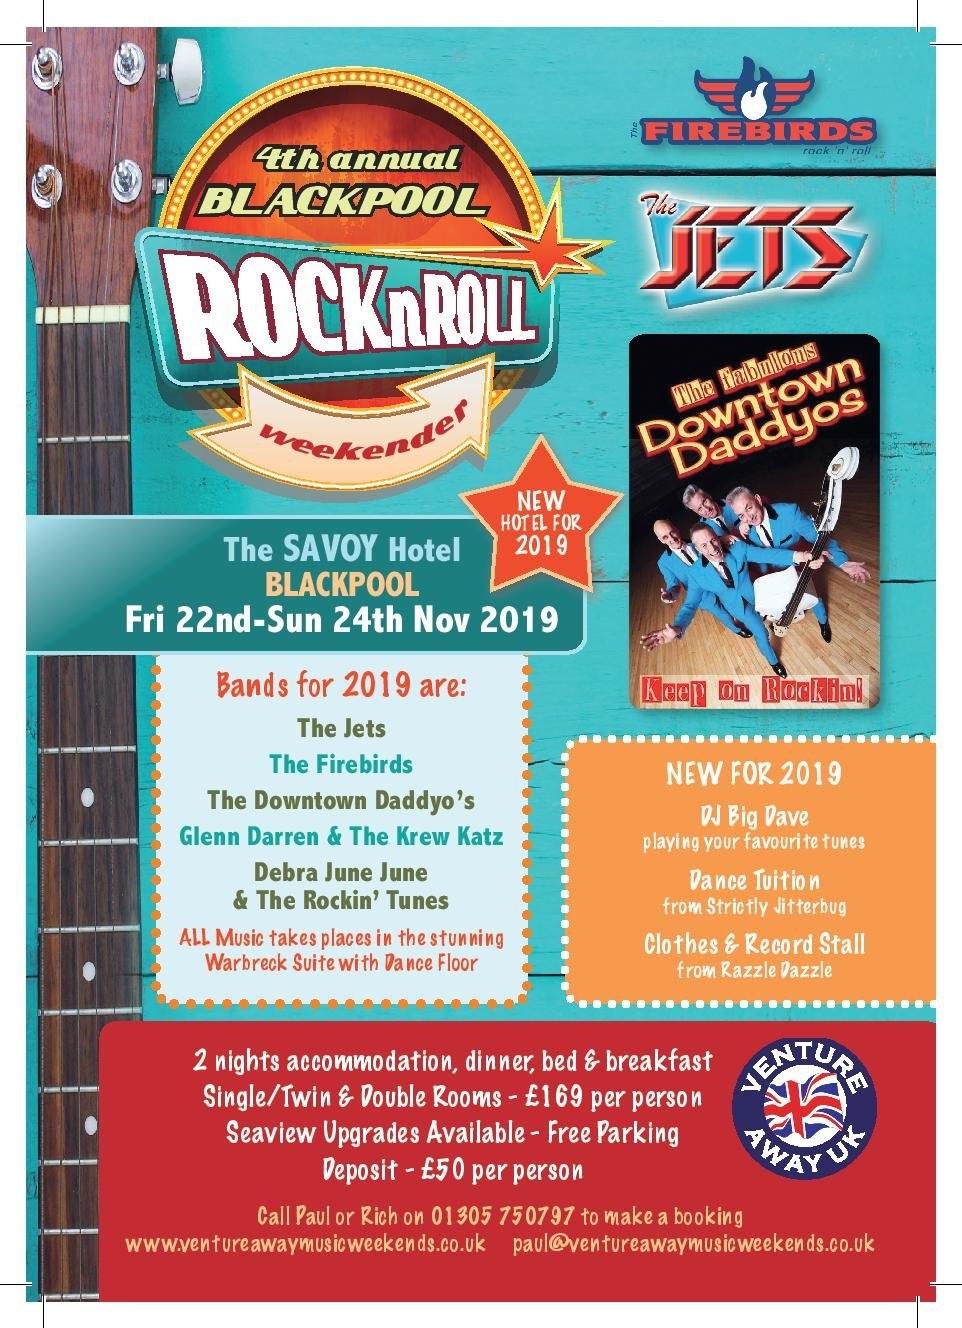 2019 Blackpool Rock & Roll Weekender : Jazz Festival Weekends Rock N Roll Calendar 2019